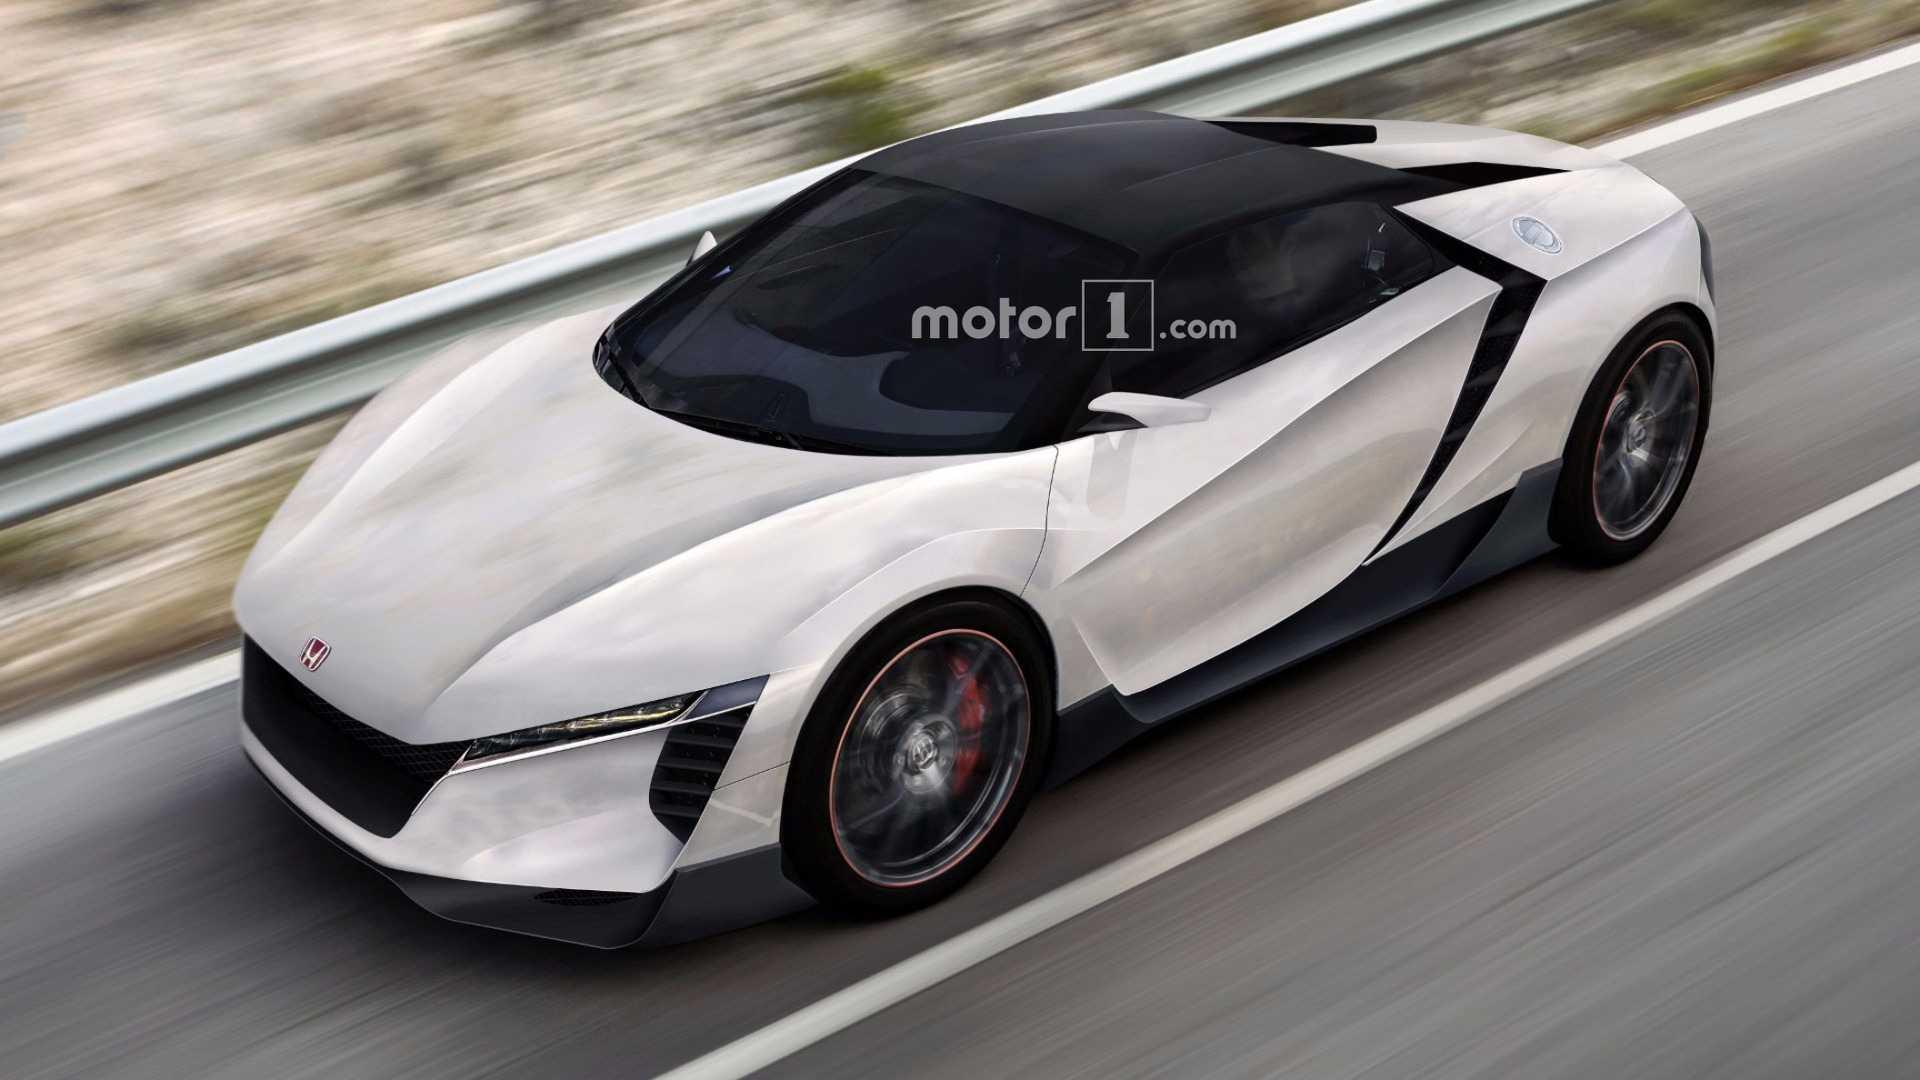 S 2000 concept